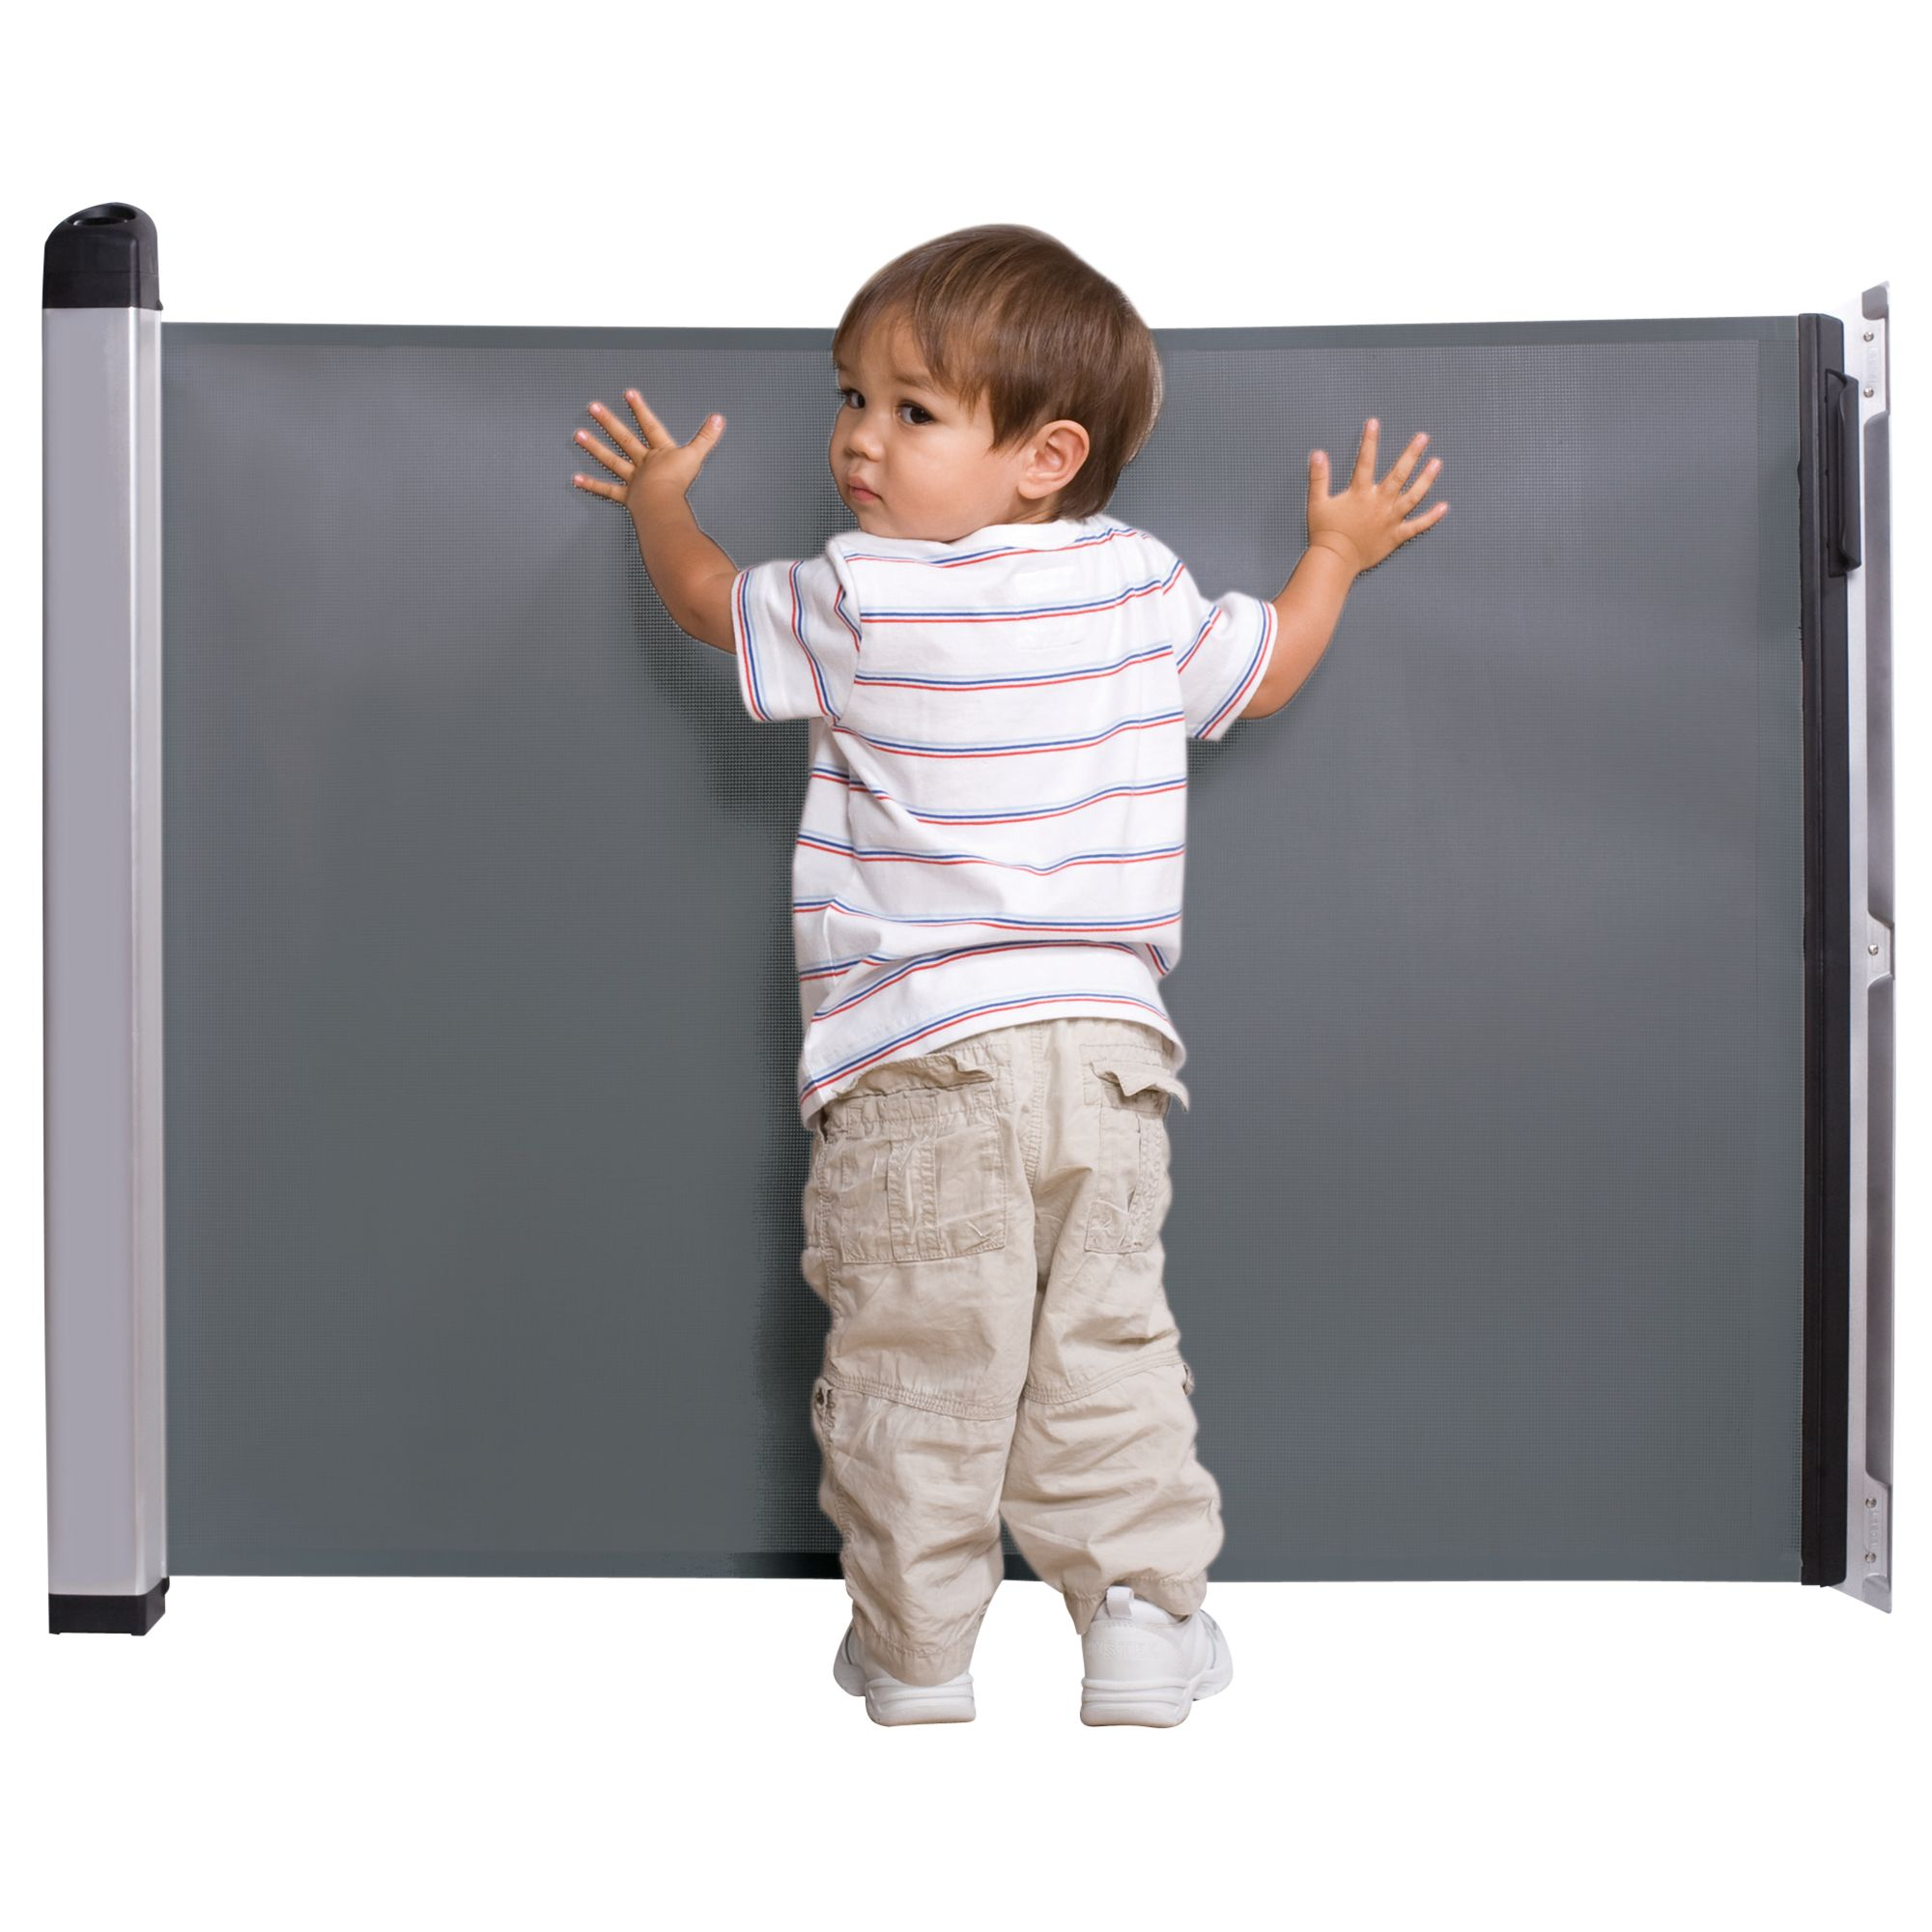 Lascal Lascal Kiddyguard Avant Safety Baby Gate